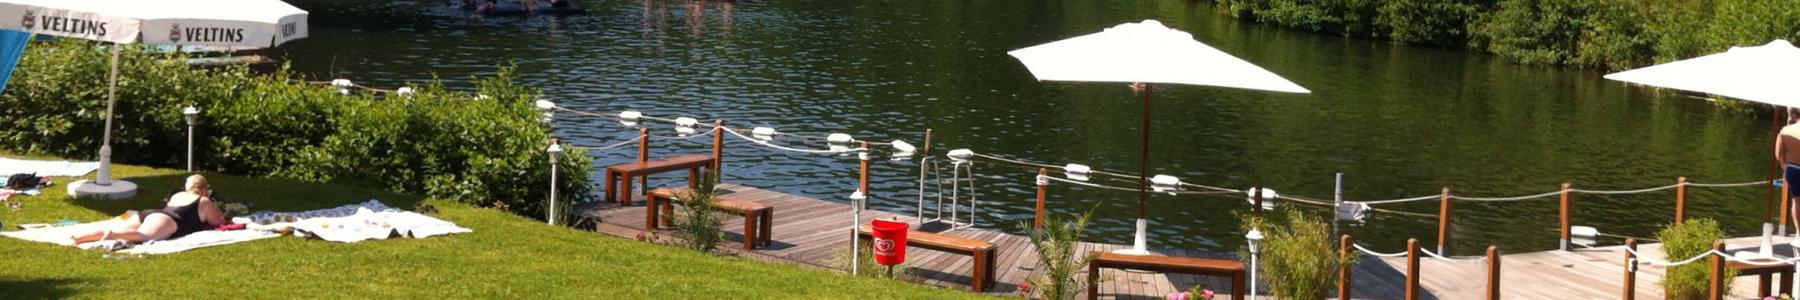 See hunde blauer vettelschoß Blauer See